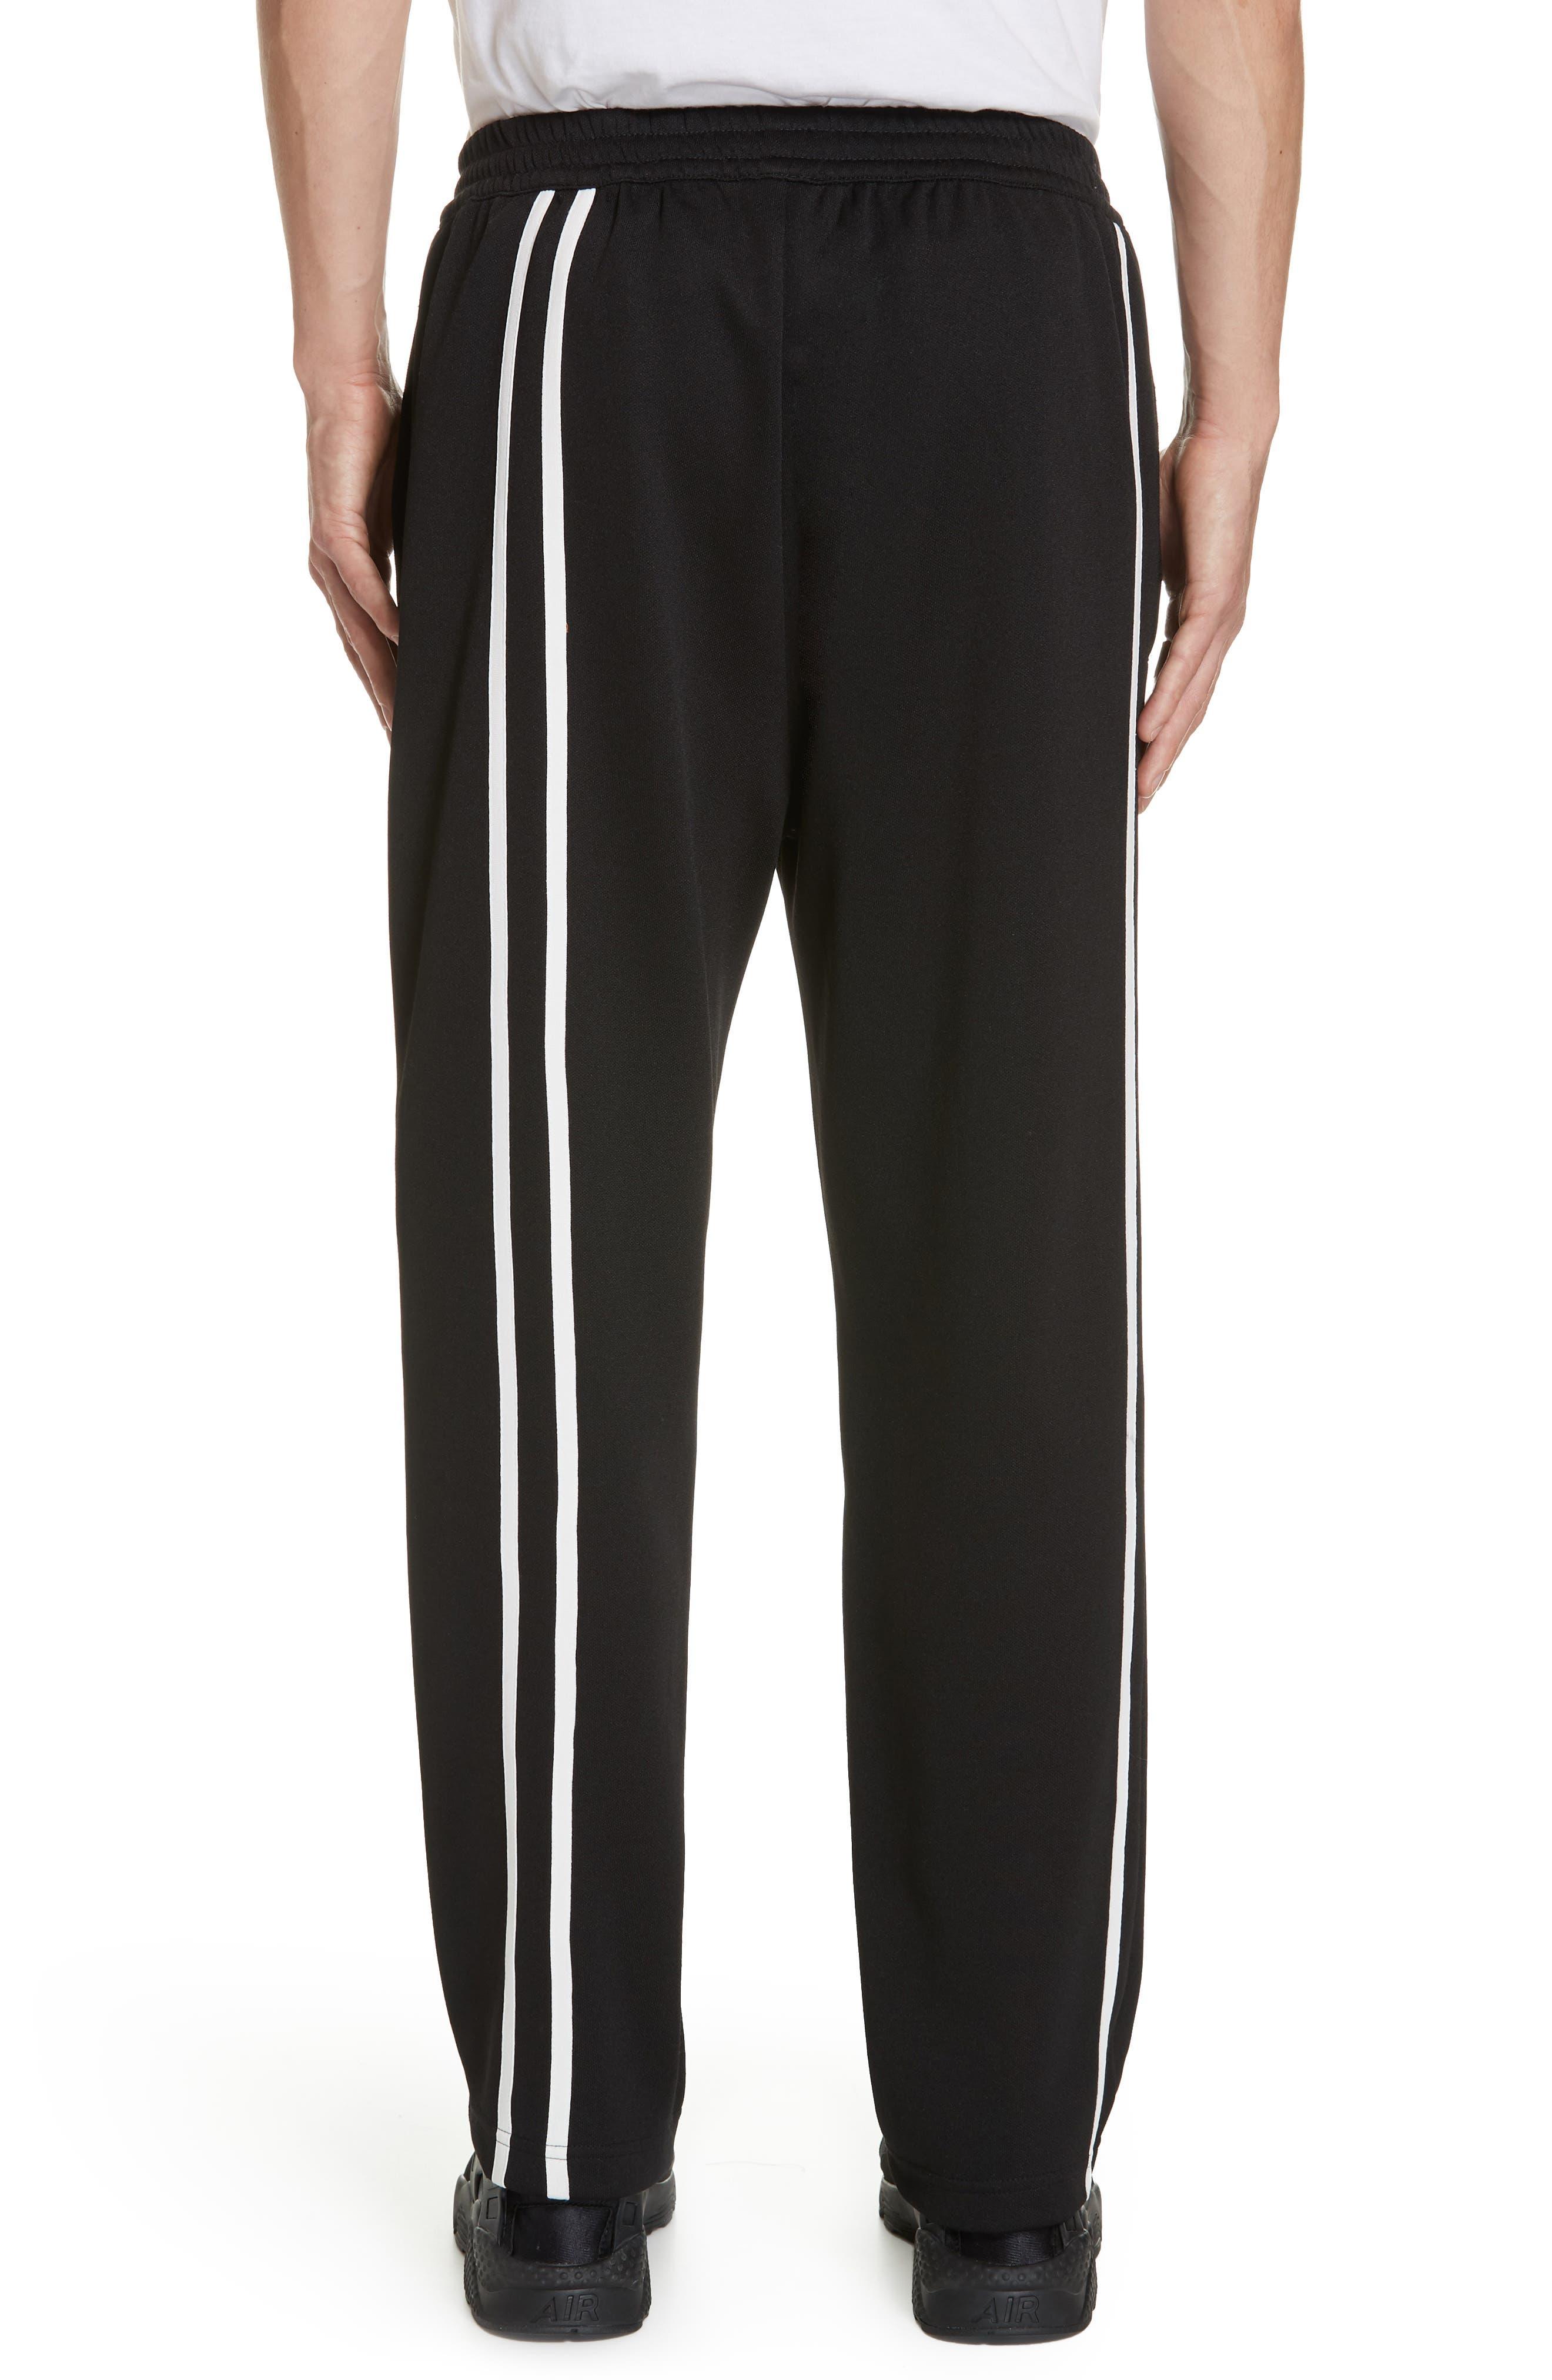 HELMUT LANG, Sport Stripe Sweatpants, Alternate thumbnail 2, color, BLACK AND WHITE